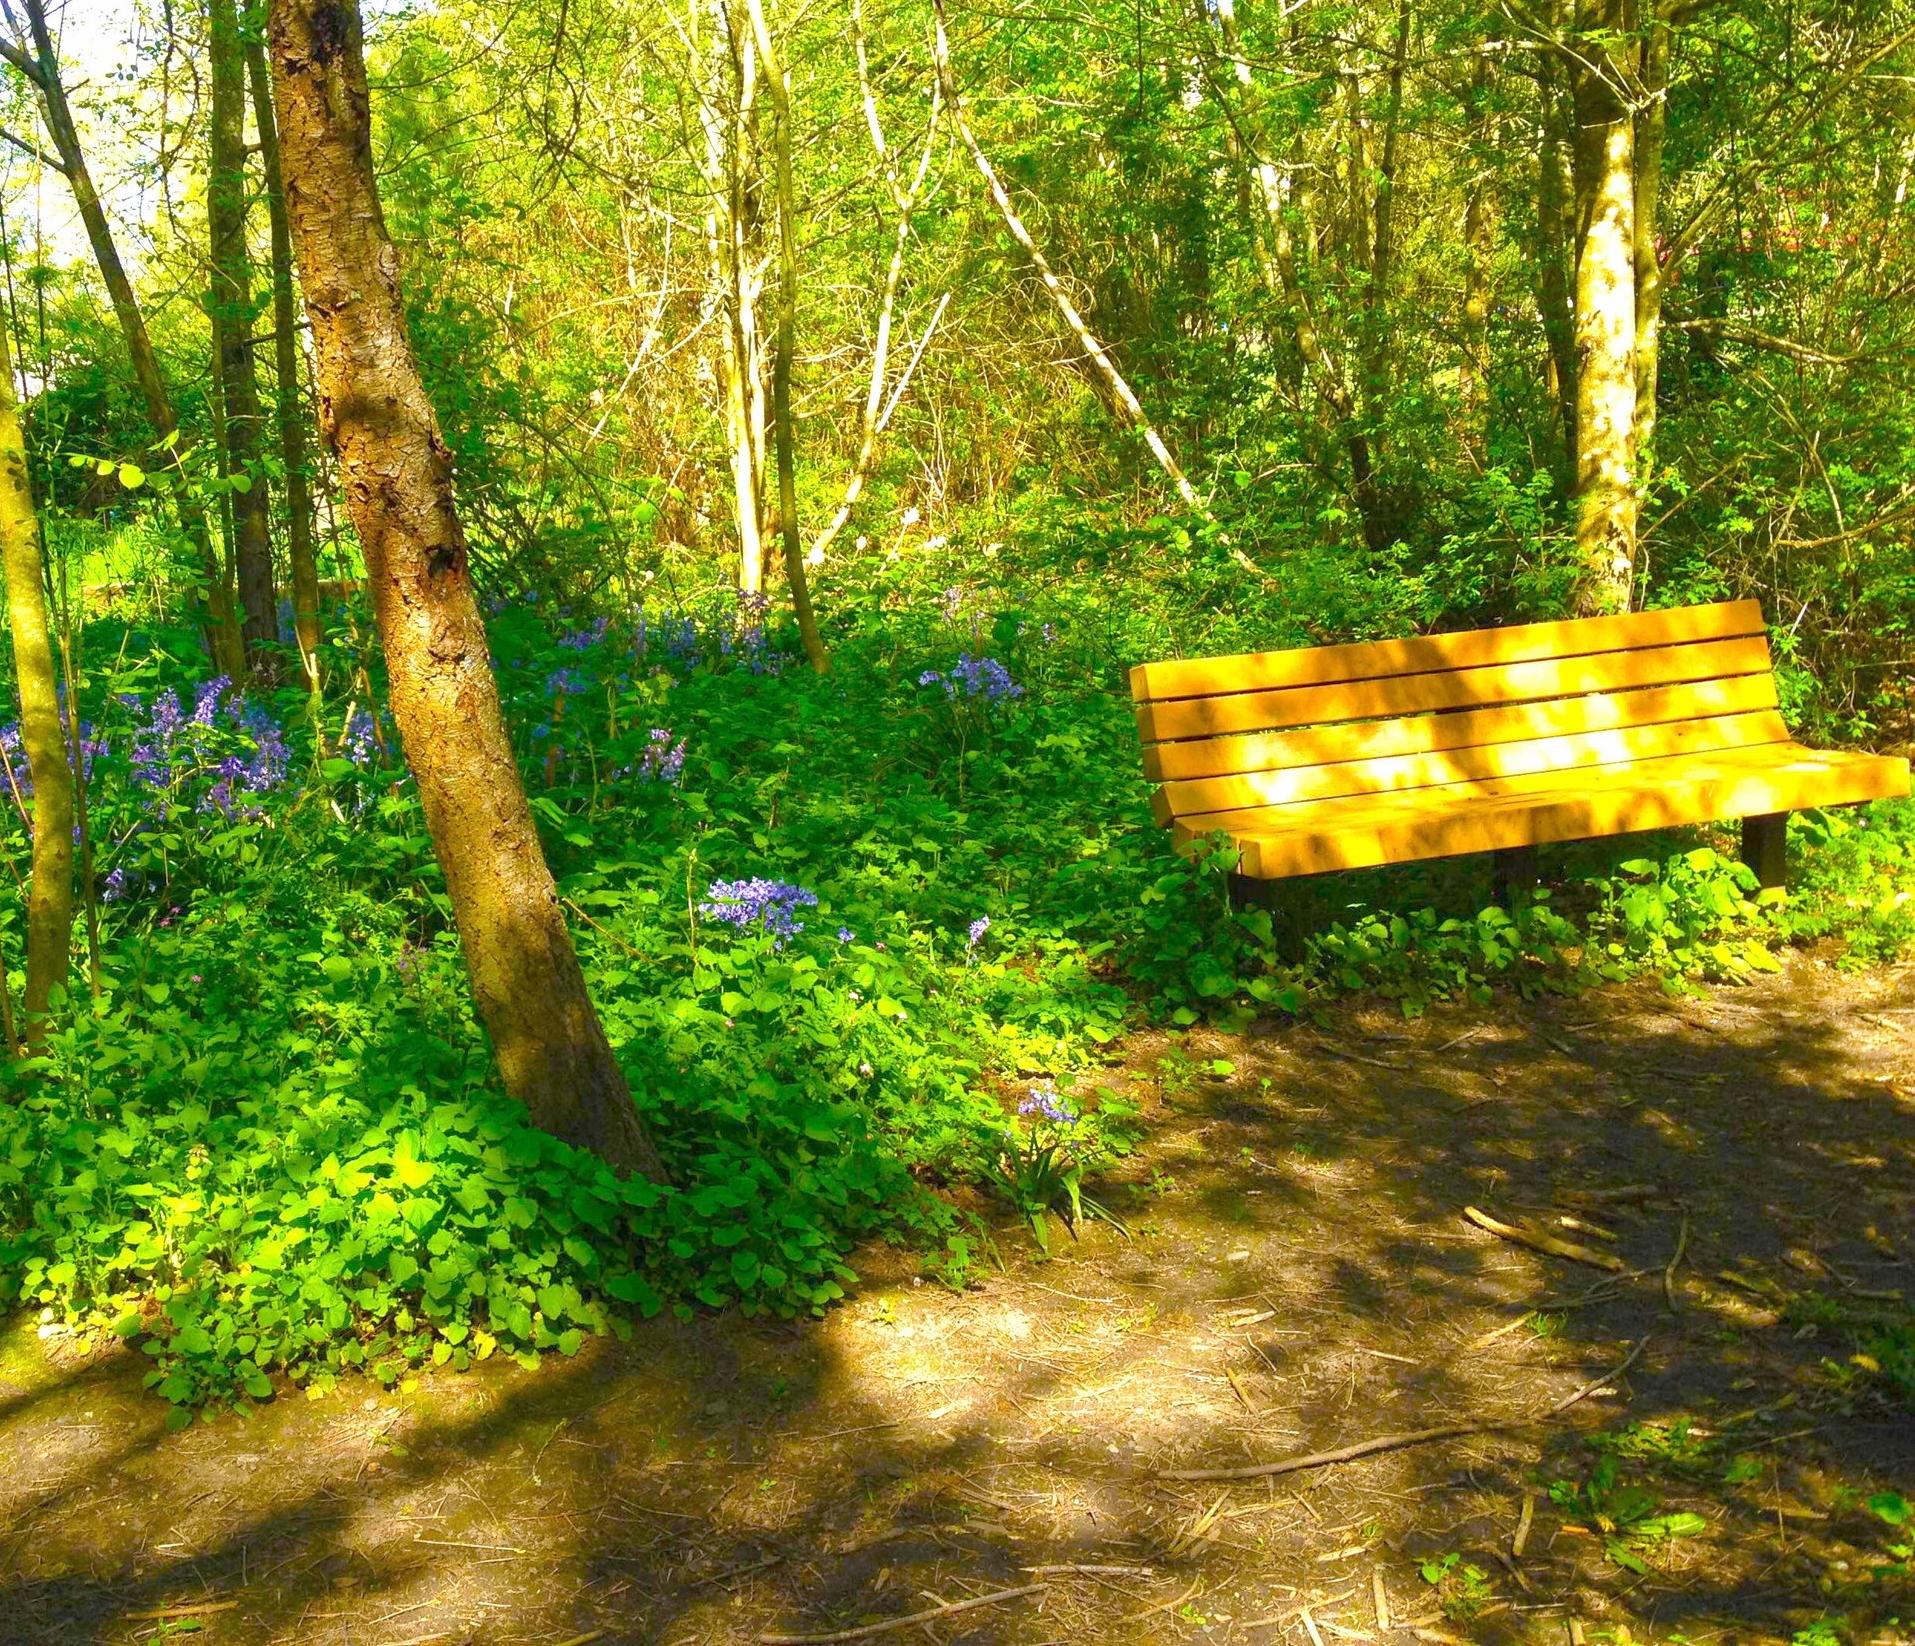 Bench-in-Mercerdale-woodlands-4-16-16_optimized.jpg